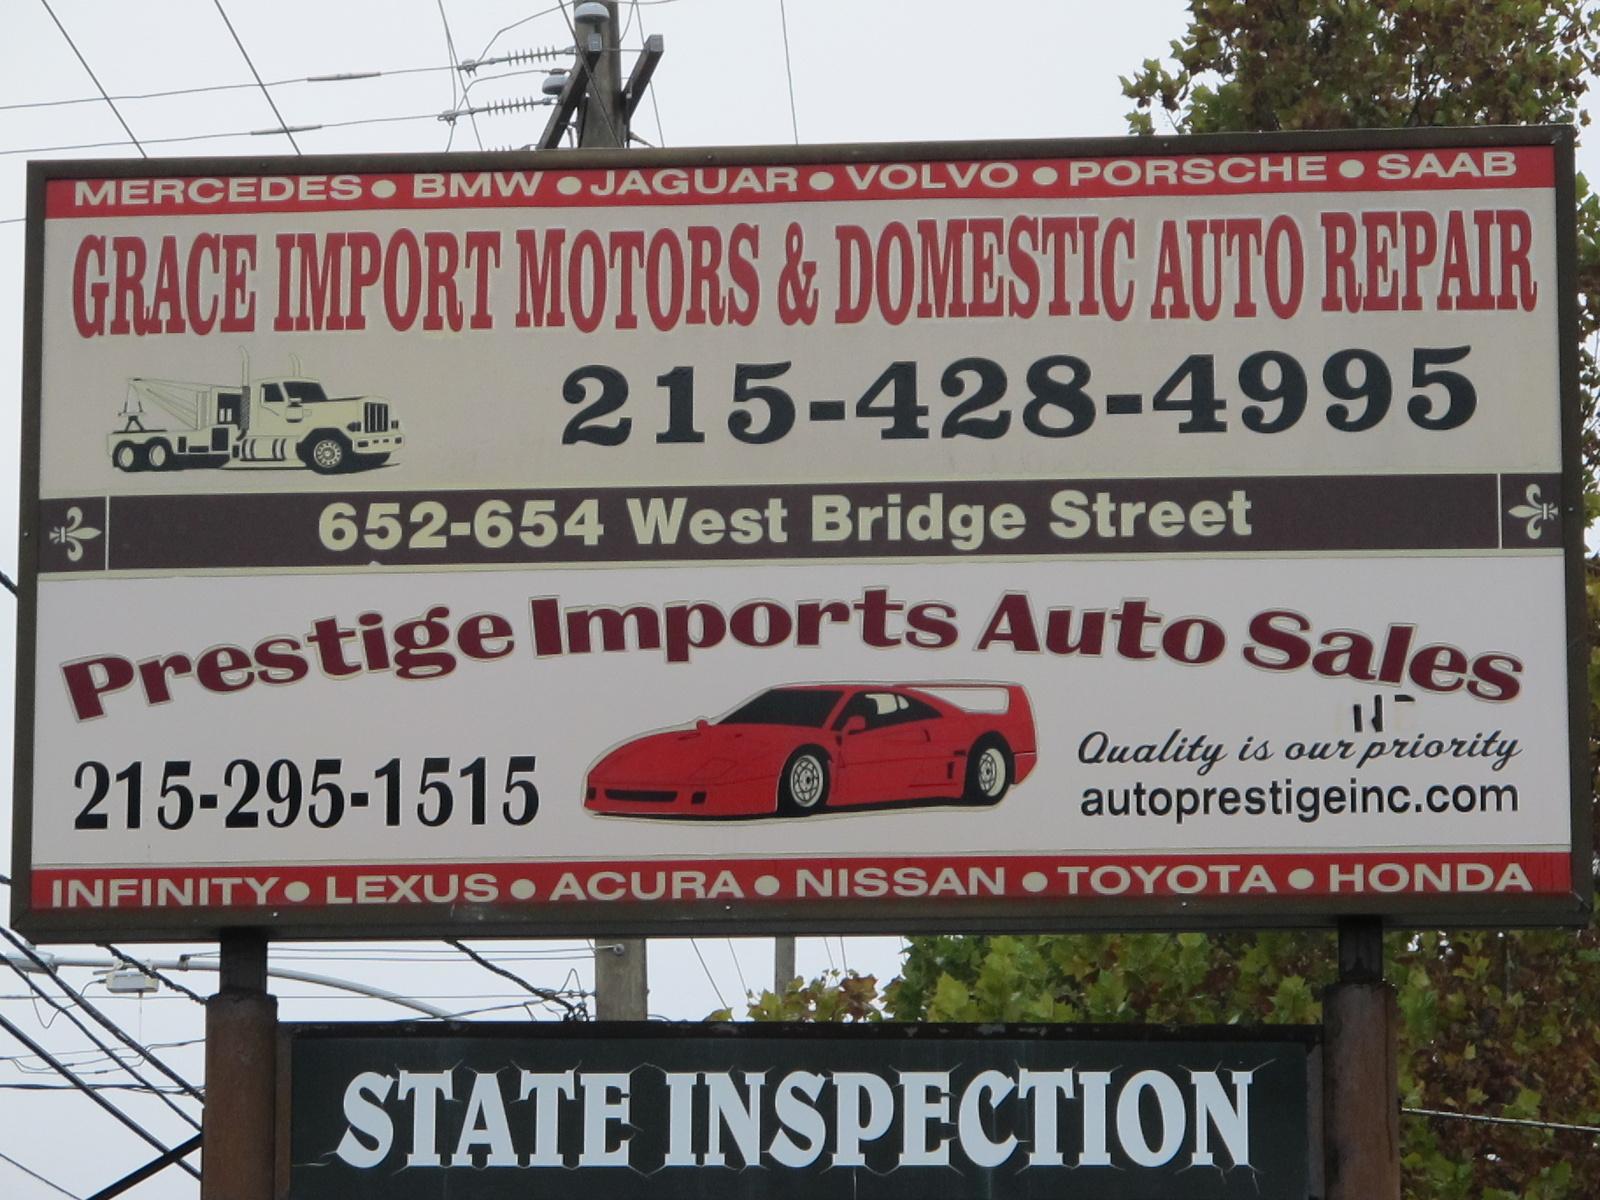 Prestige Imports Auto Sales Morrisville PA Read Consumer reviews